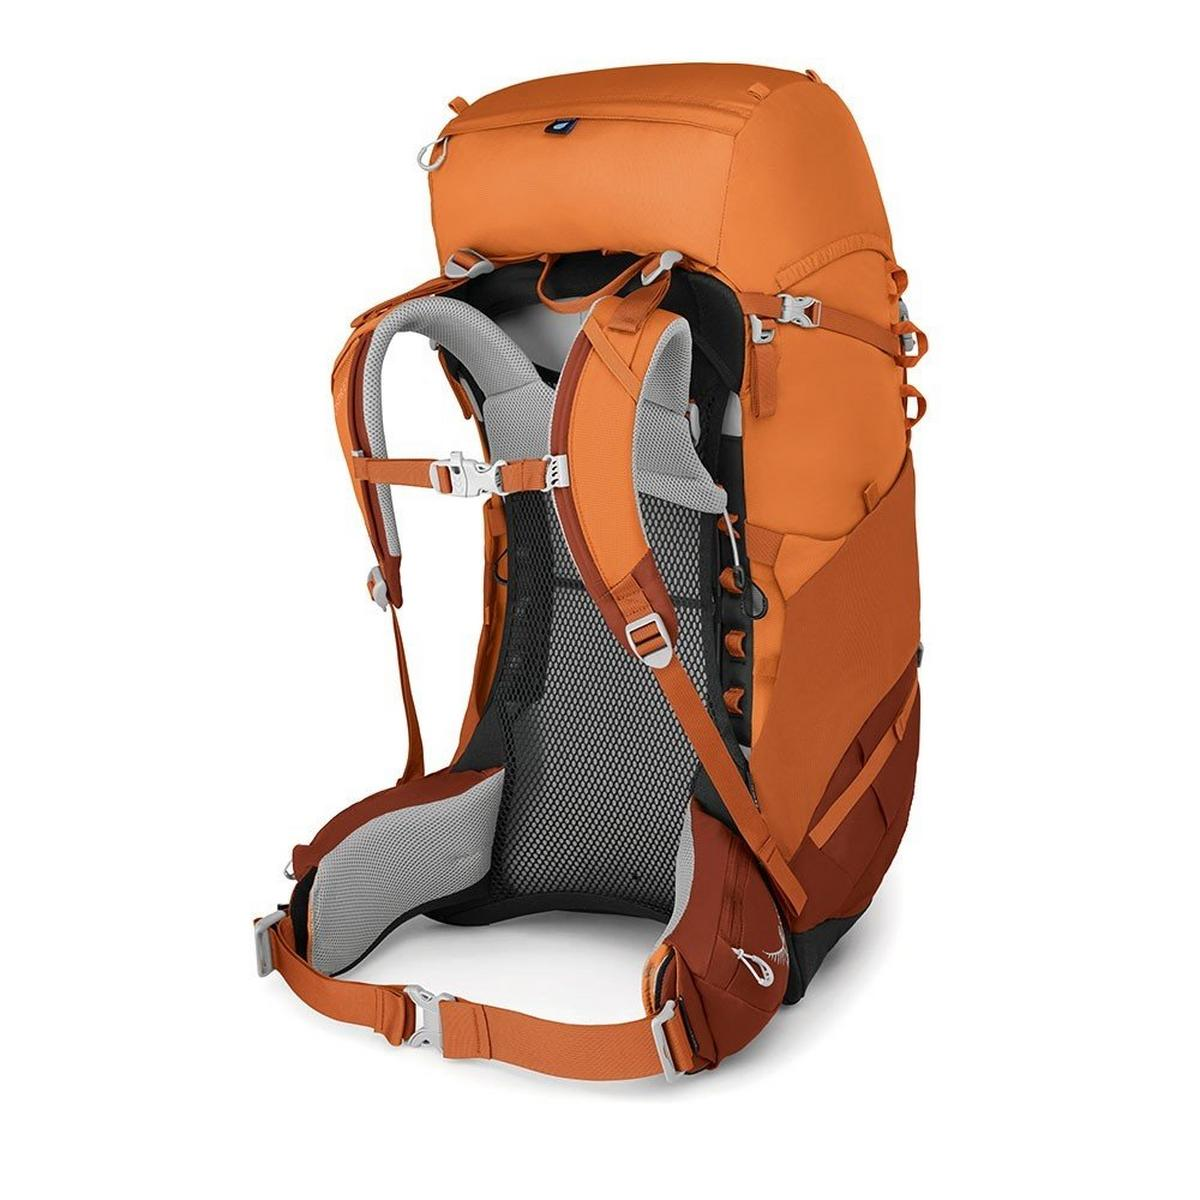 Osprey Kid's Ace 50L Rucksack - Orange